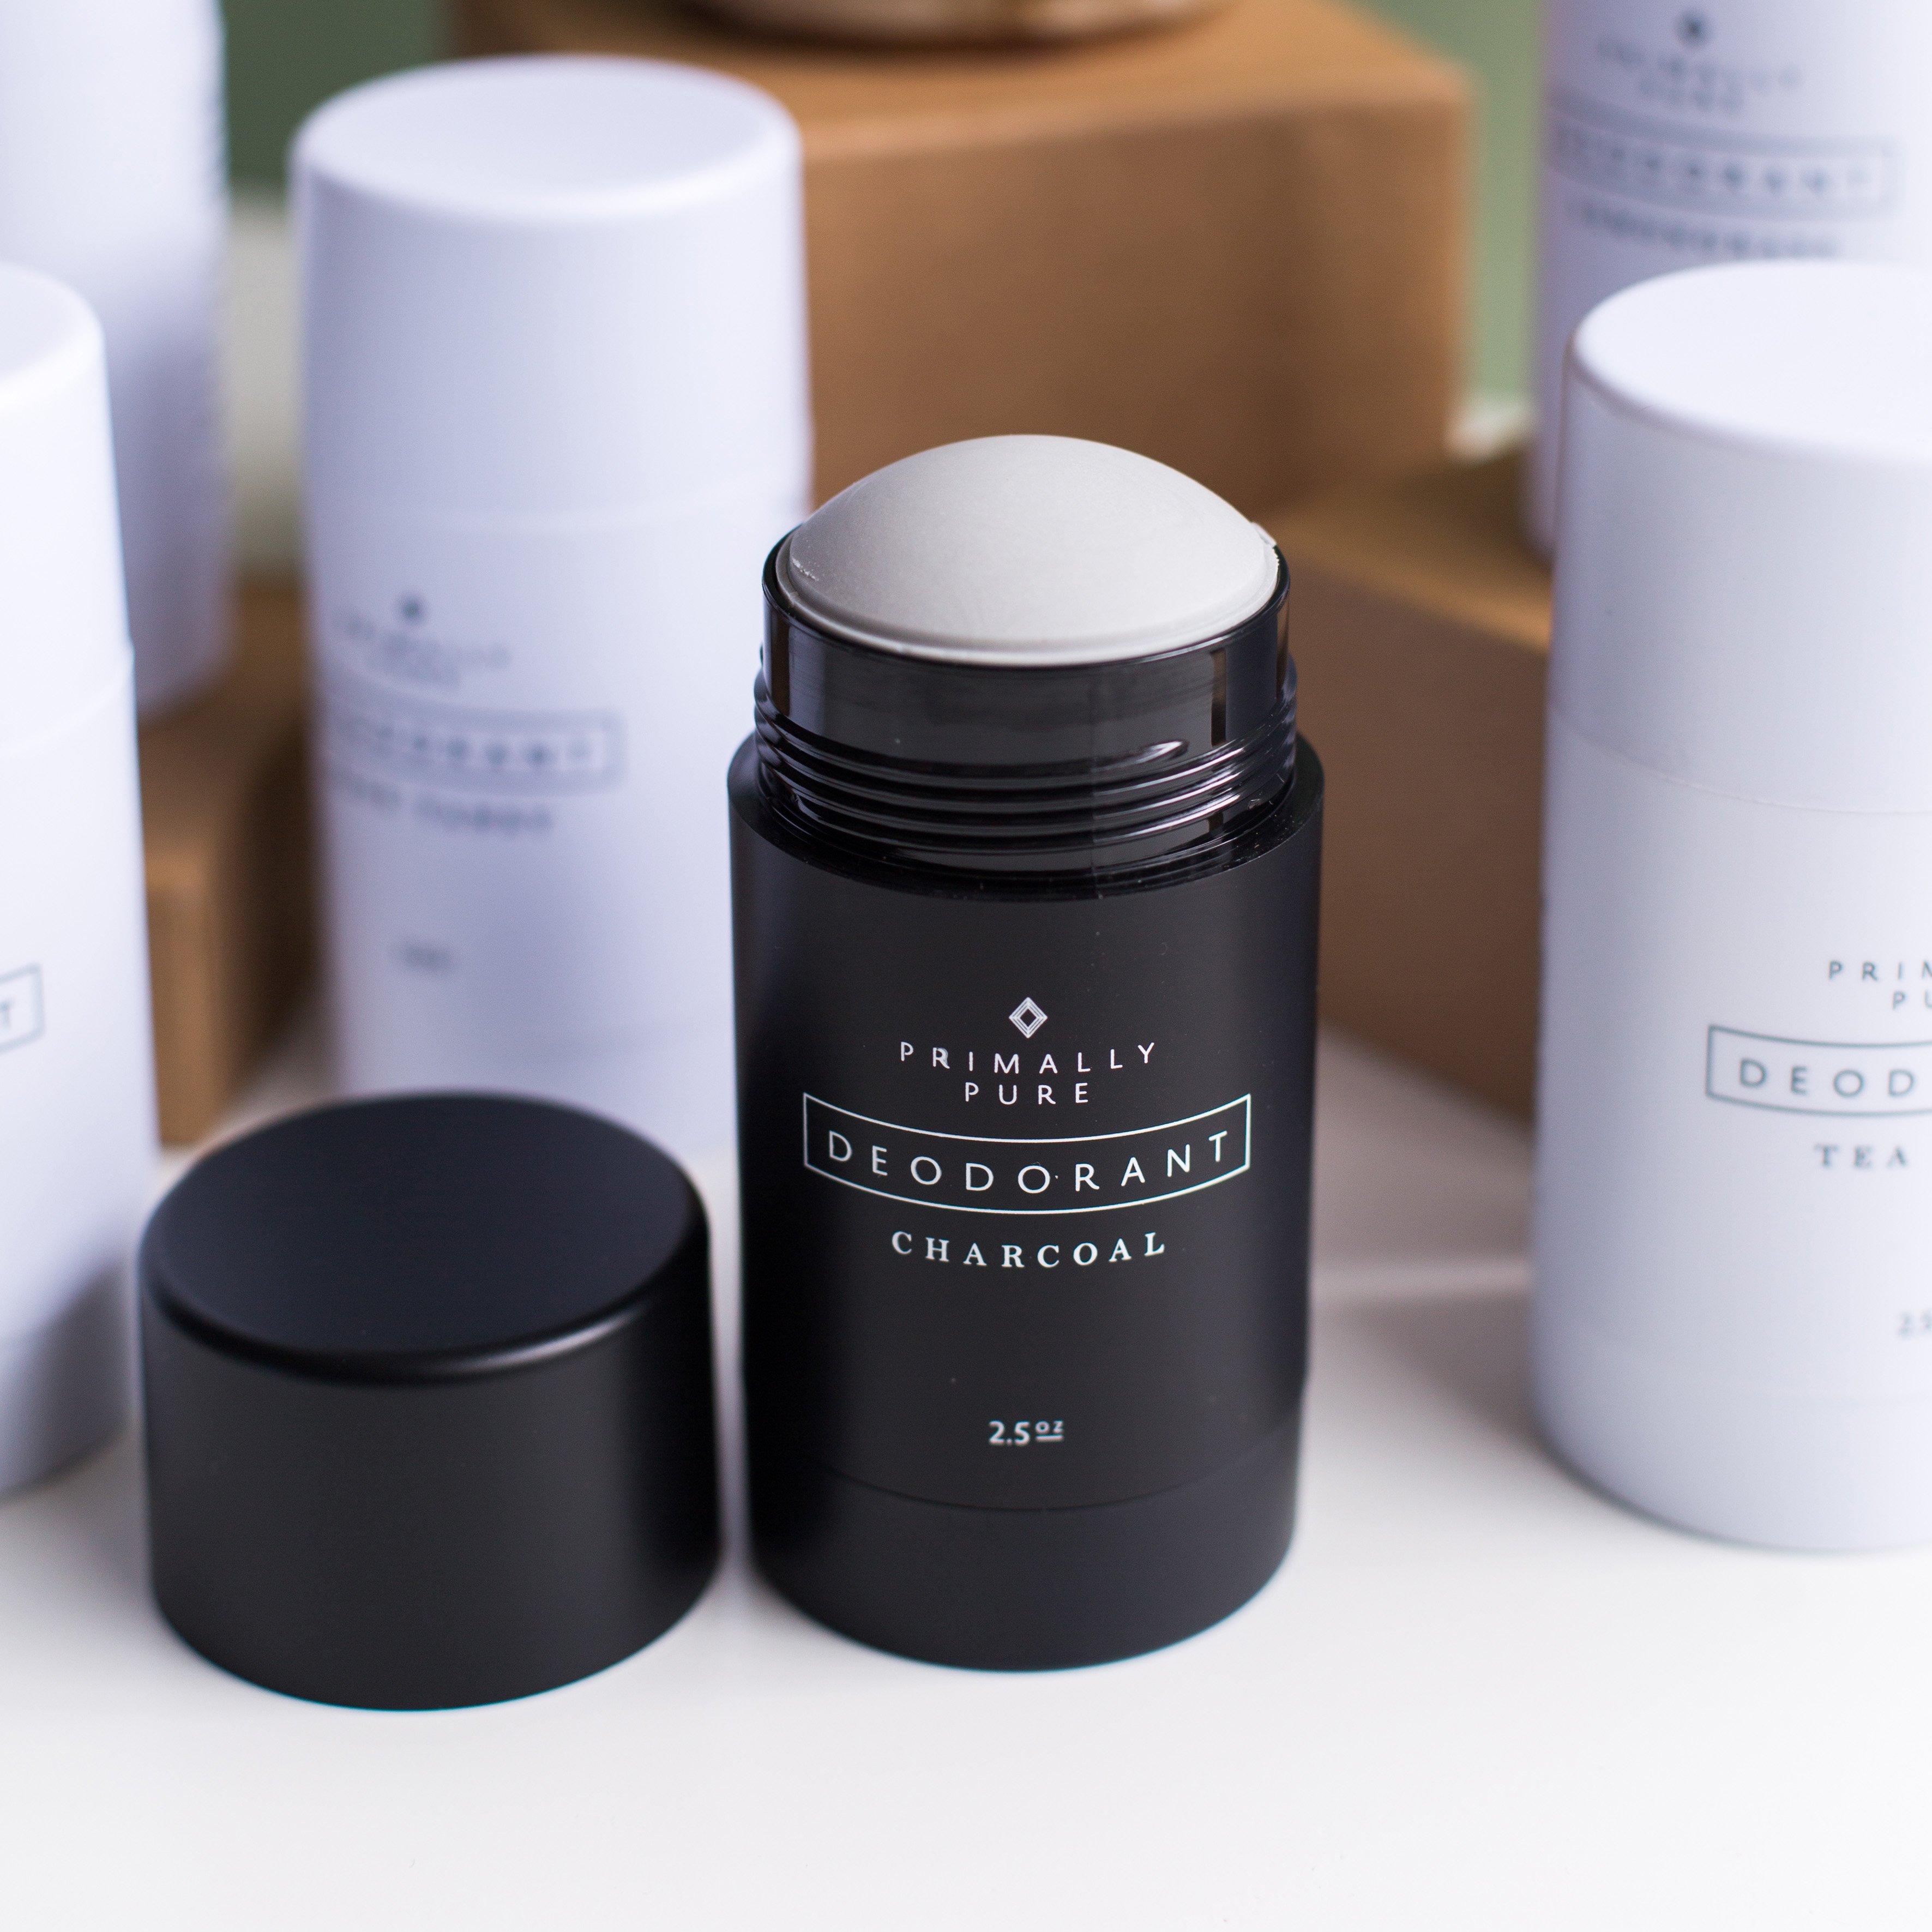 Image of primally pure deodorant